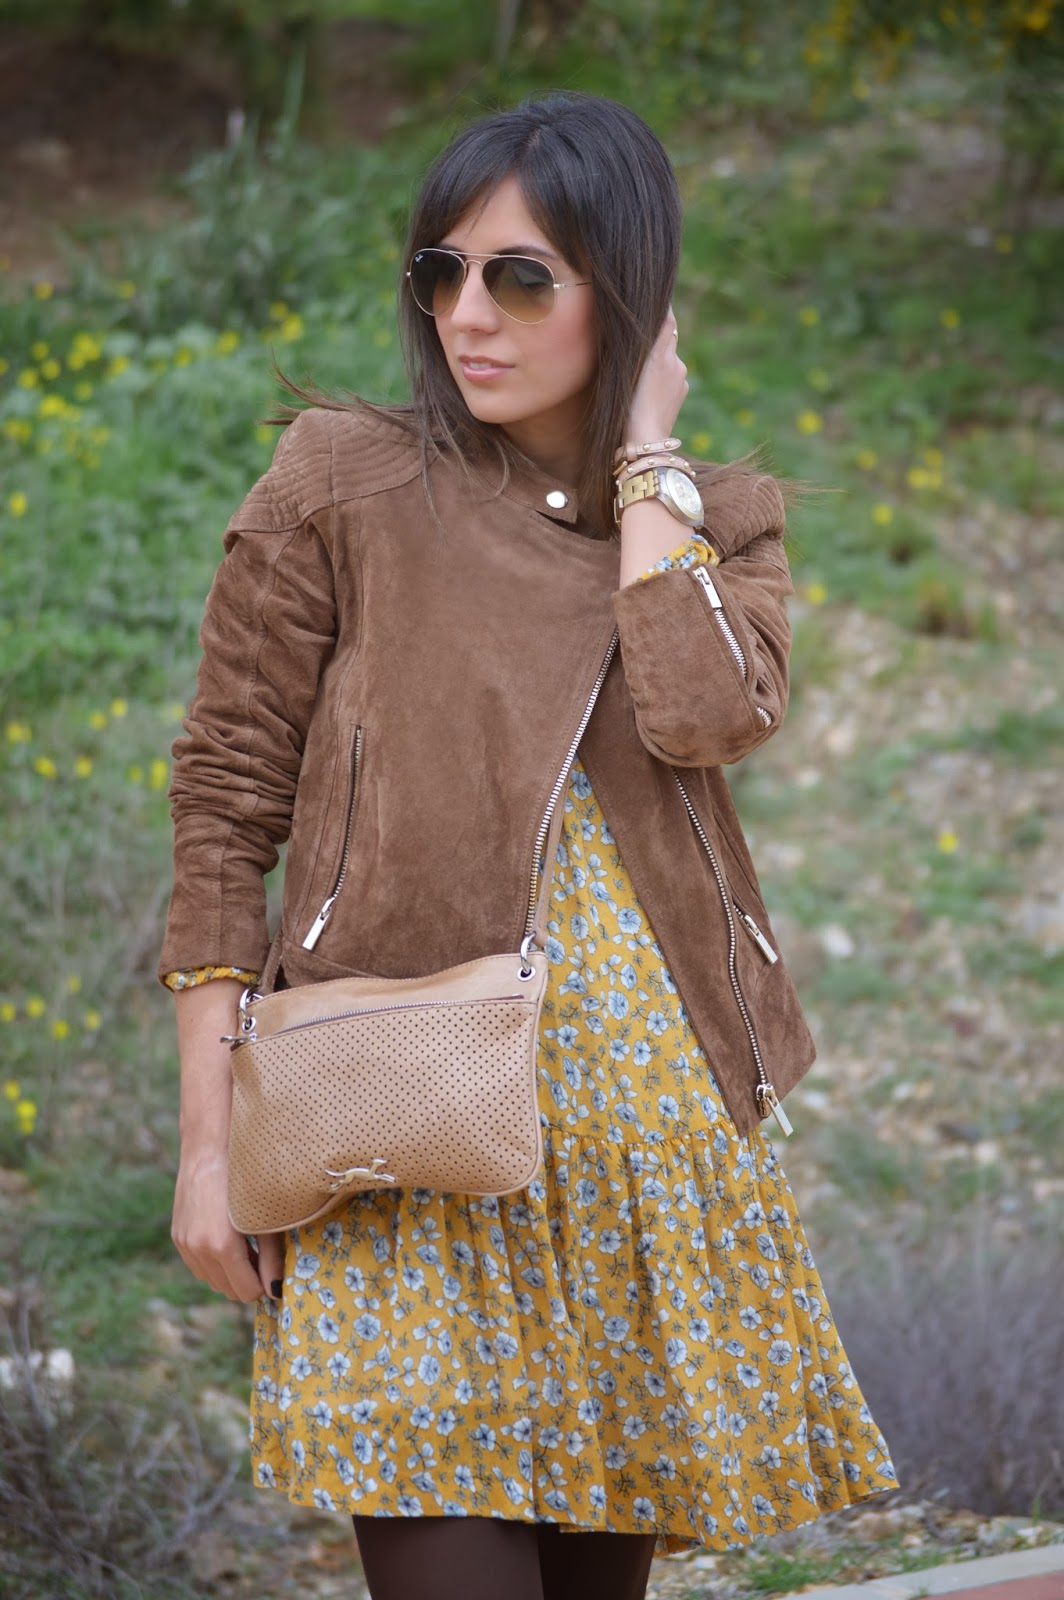 street style fashion blogger malagueña cristina style blogger malagueña malaga style blogger inspiration gorgeous stunning lovely tendencias moda ootd zara mango stylekiu